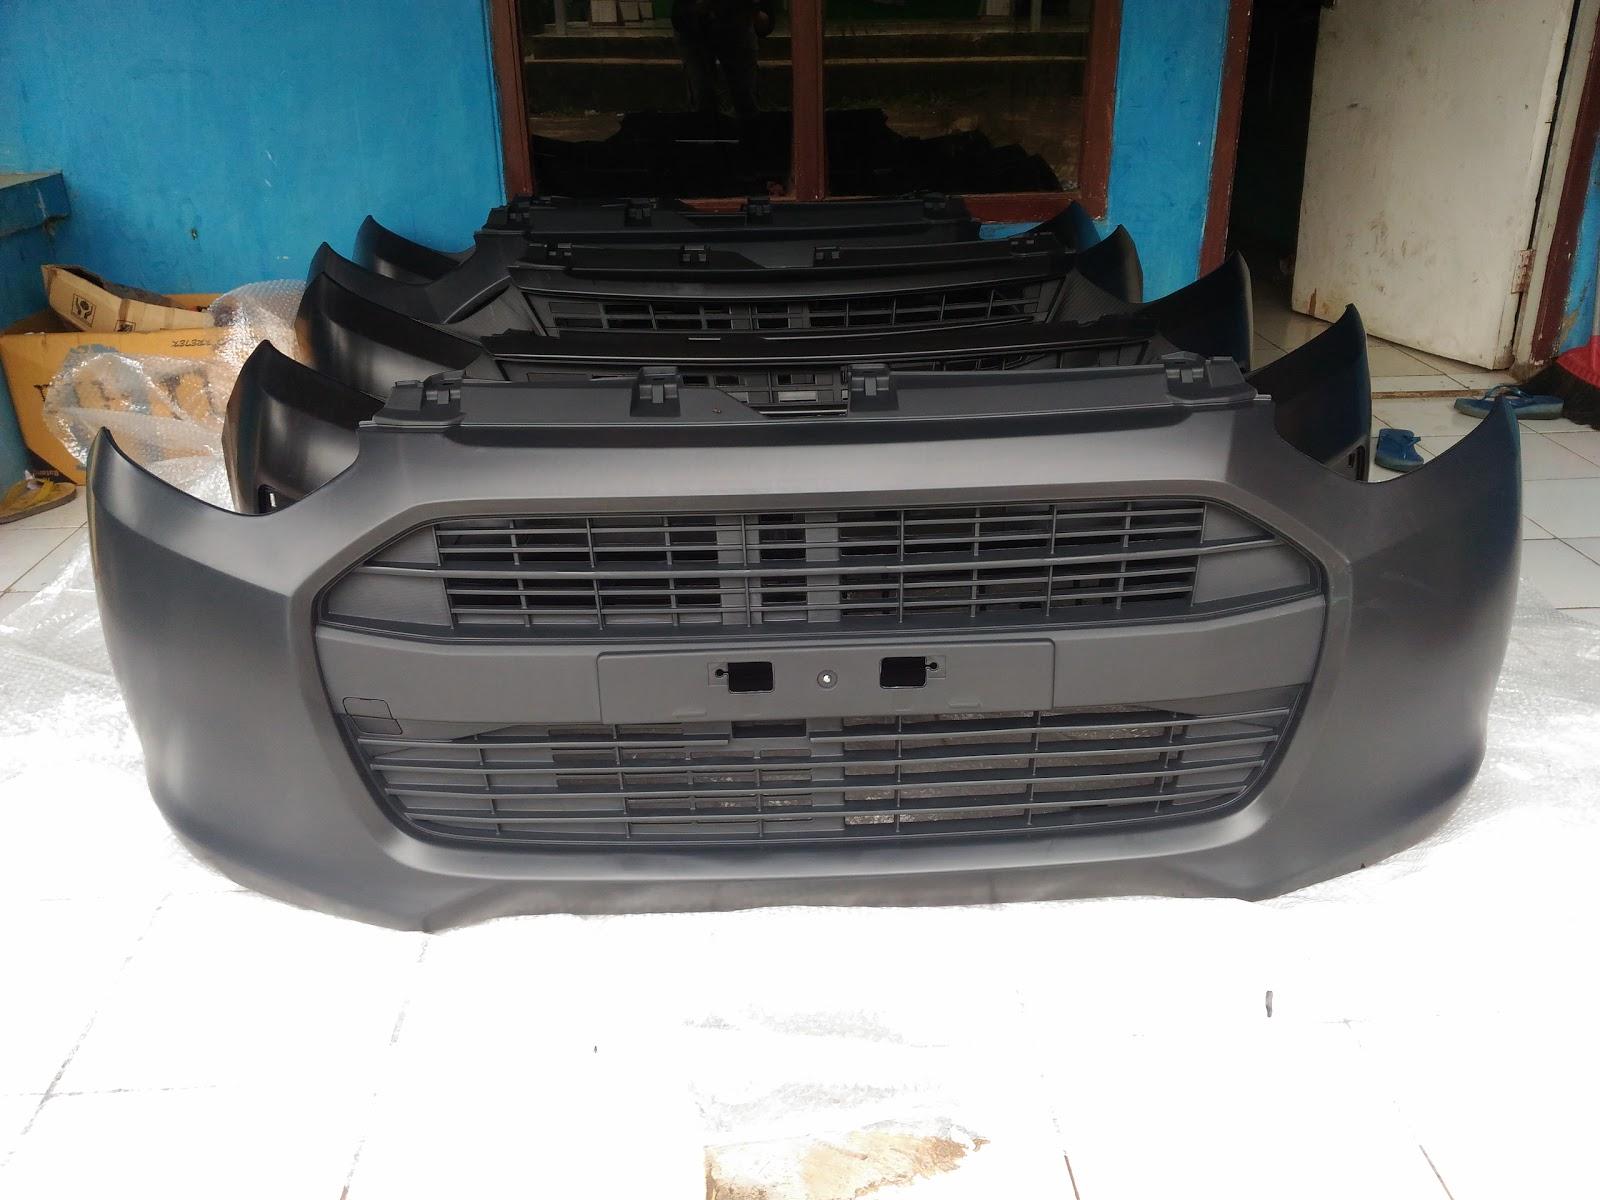 Bumper Ayla Agya Baru | Body kit Mobil